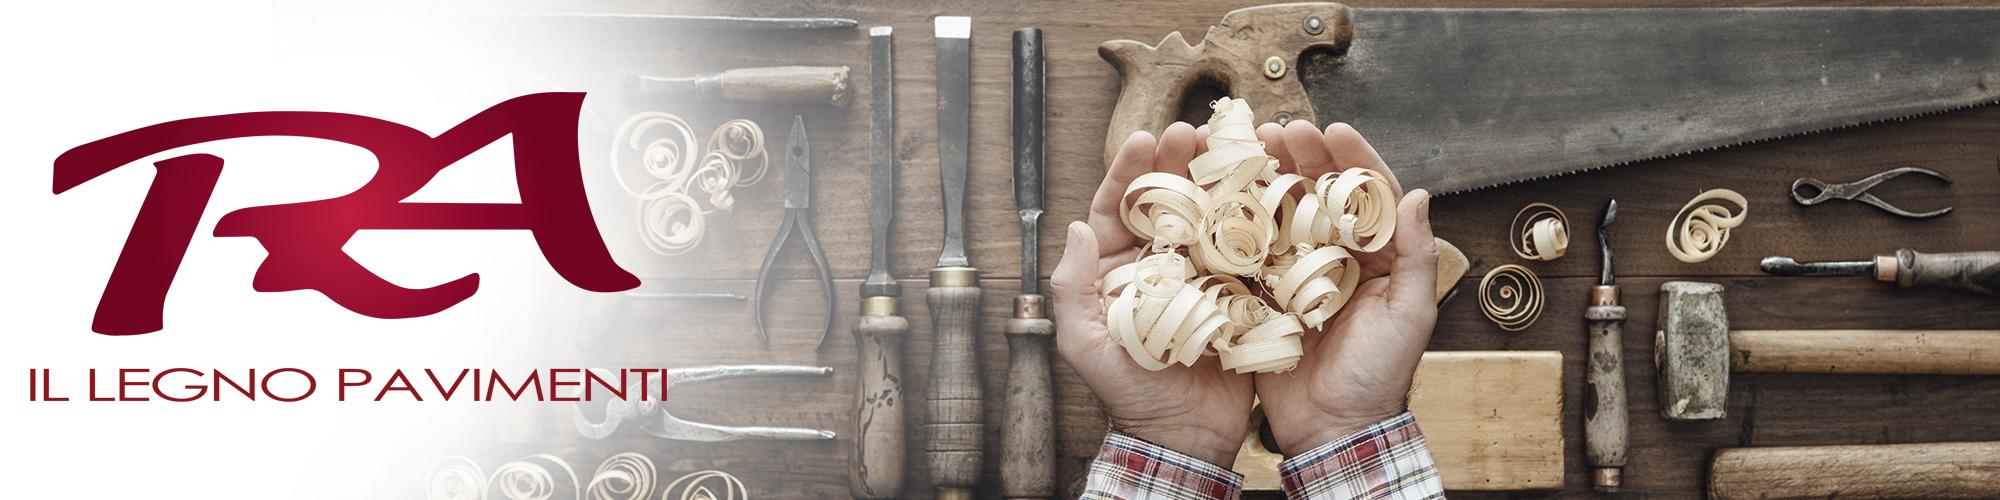 ra-legno-parquet-borgosesia